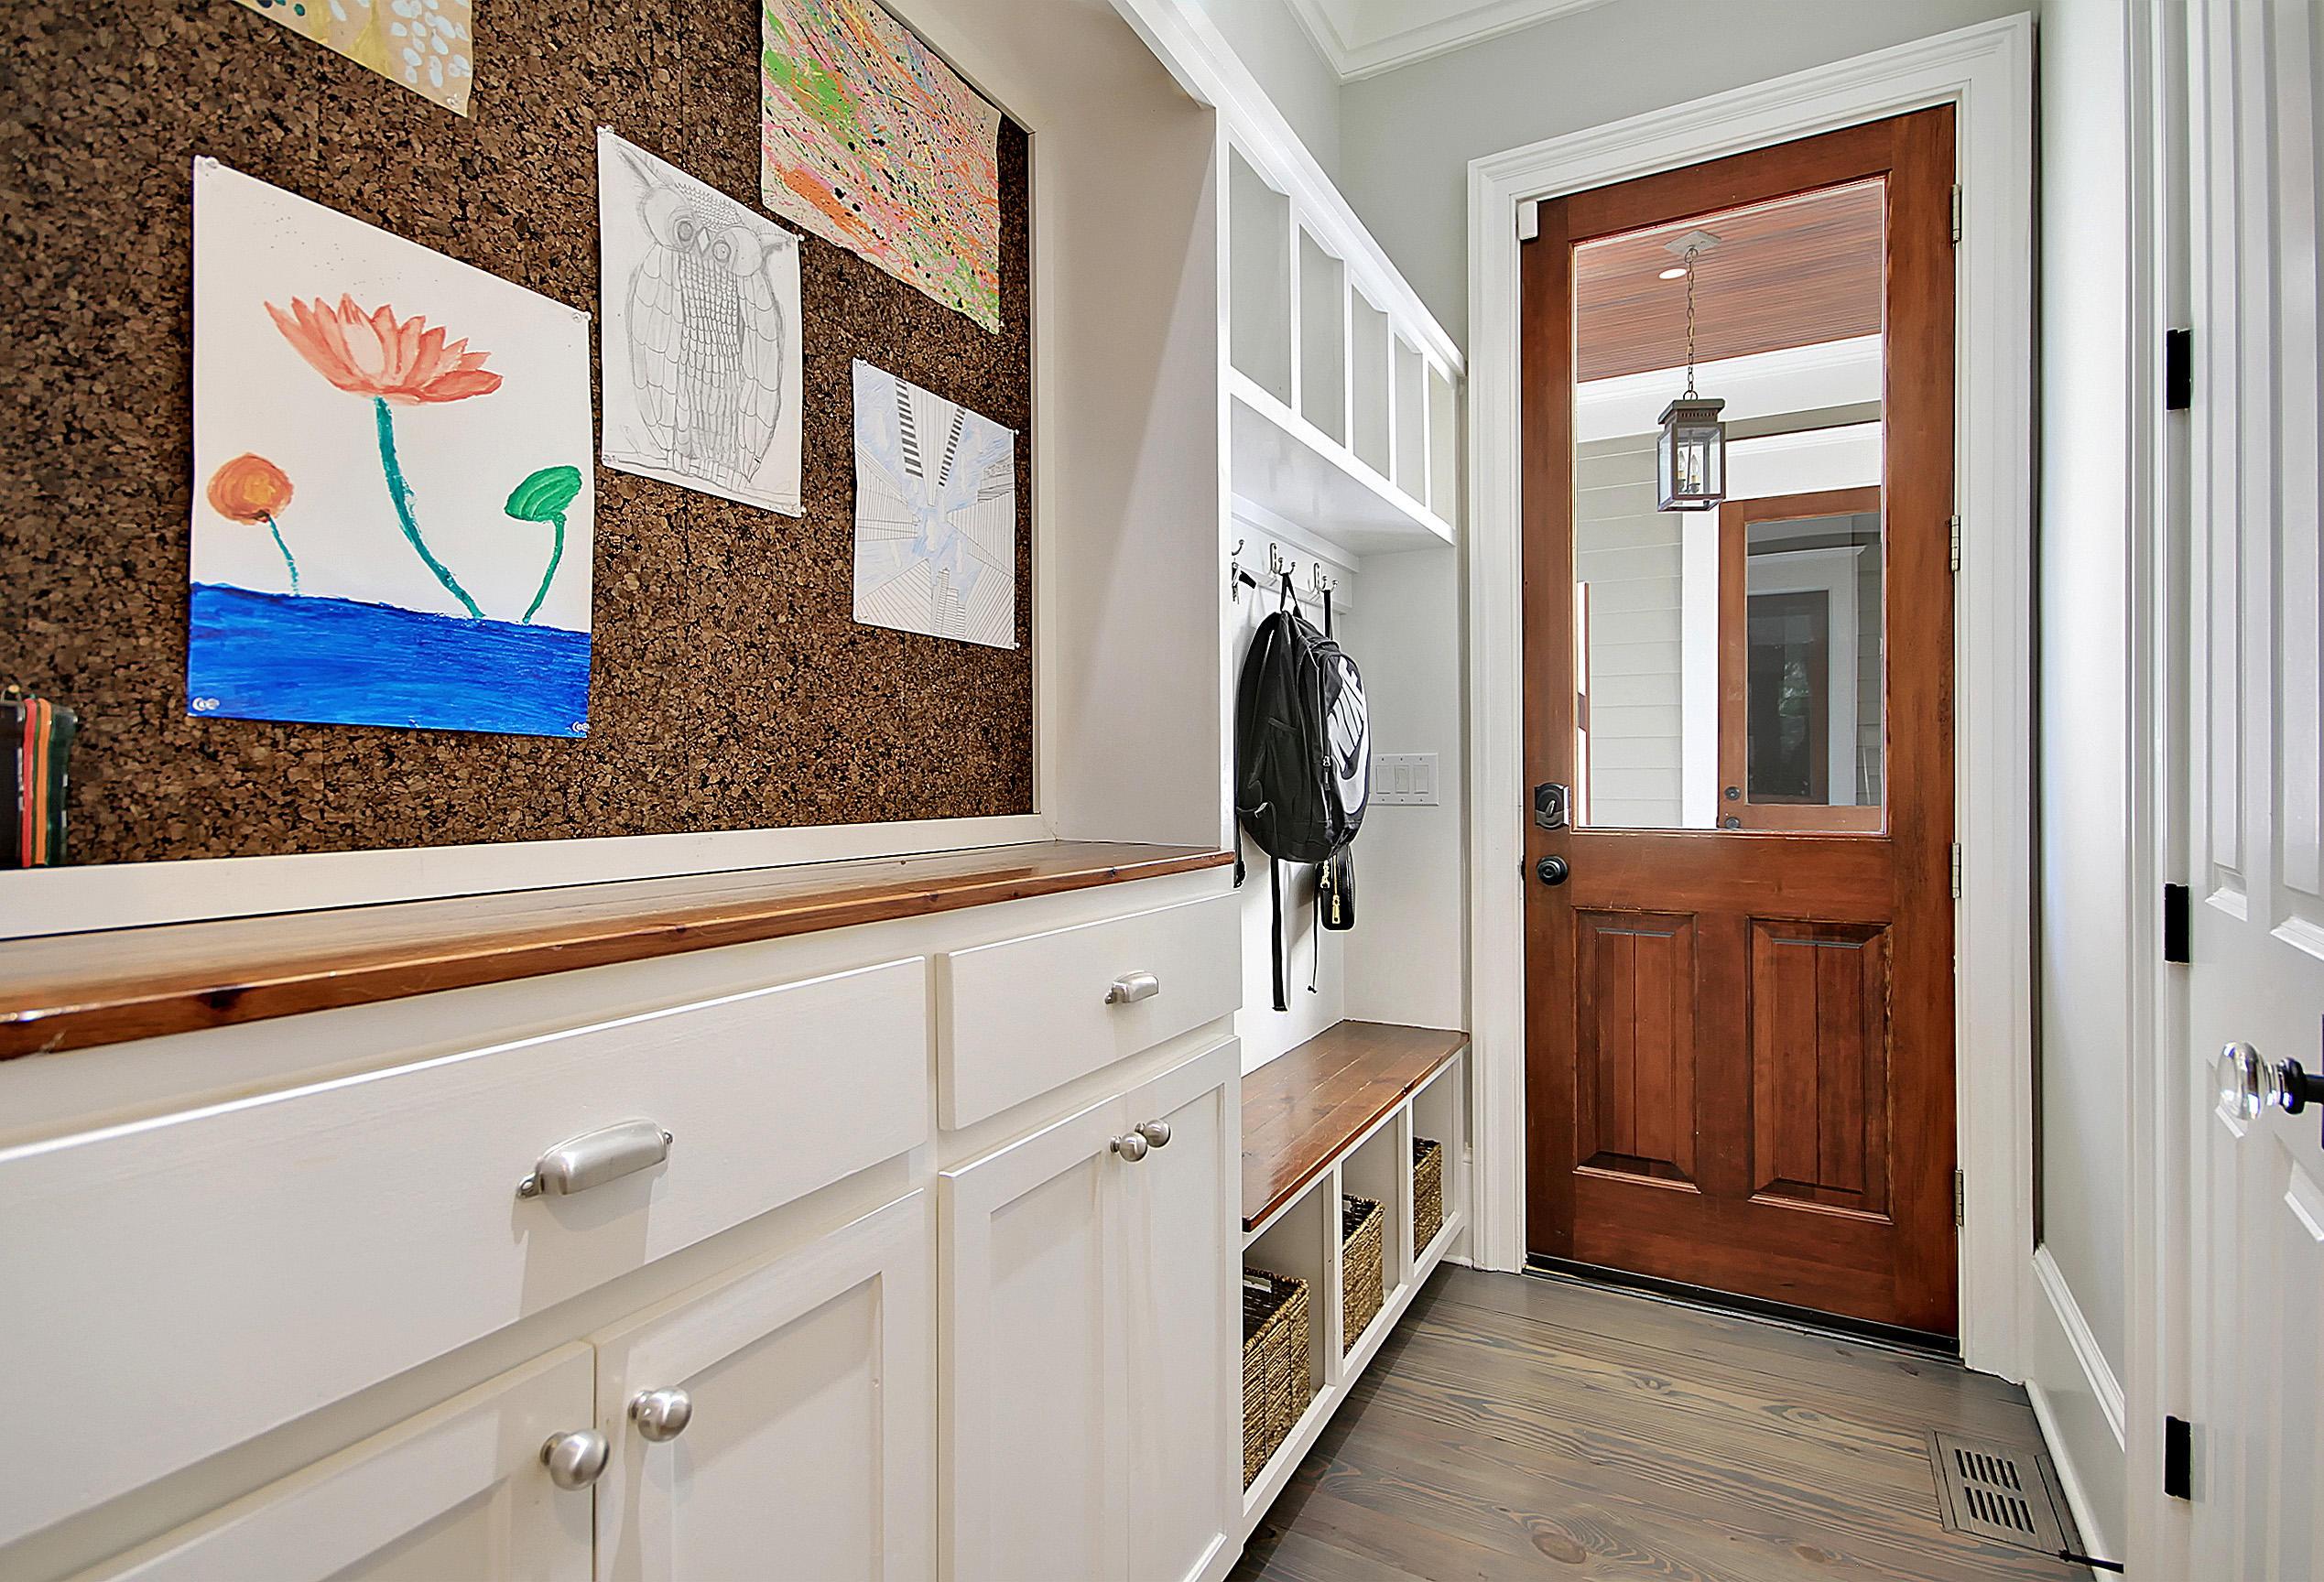 Daniel Island Park Homes For Sale - 231 Delahow, Daniel Island, SC - 33